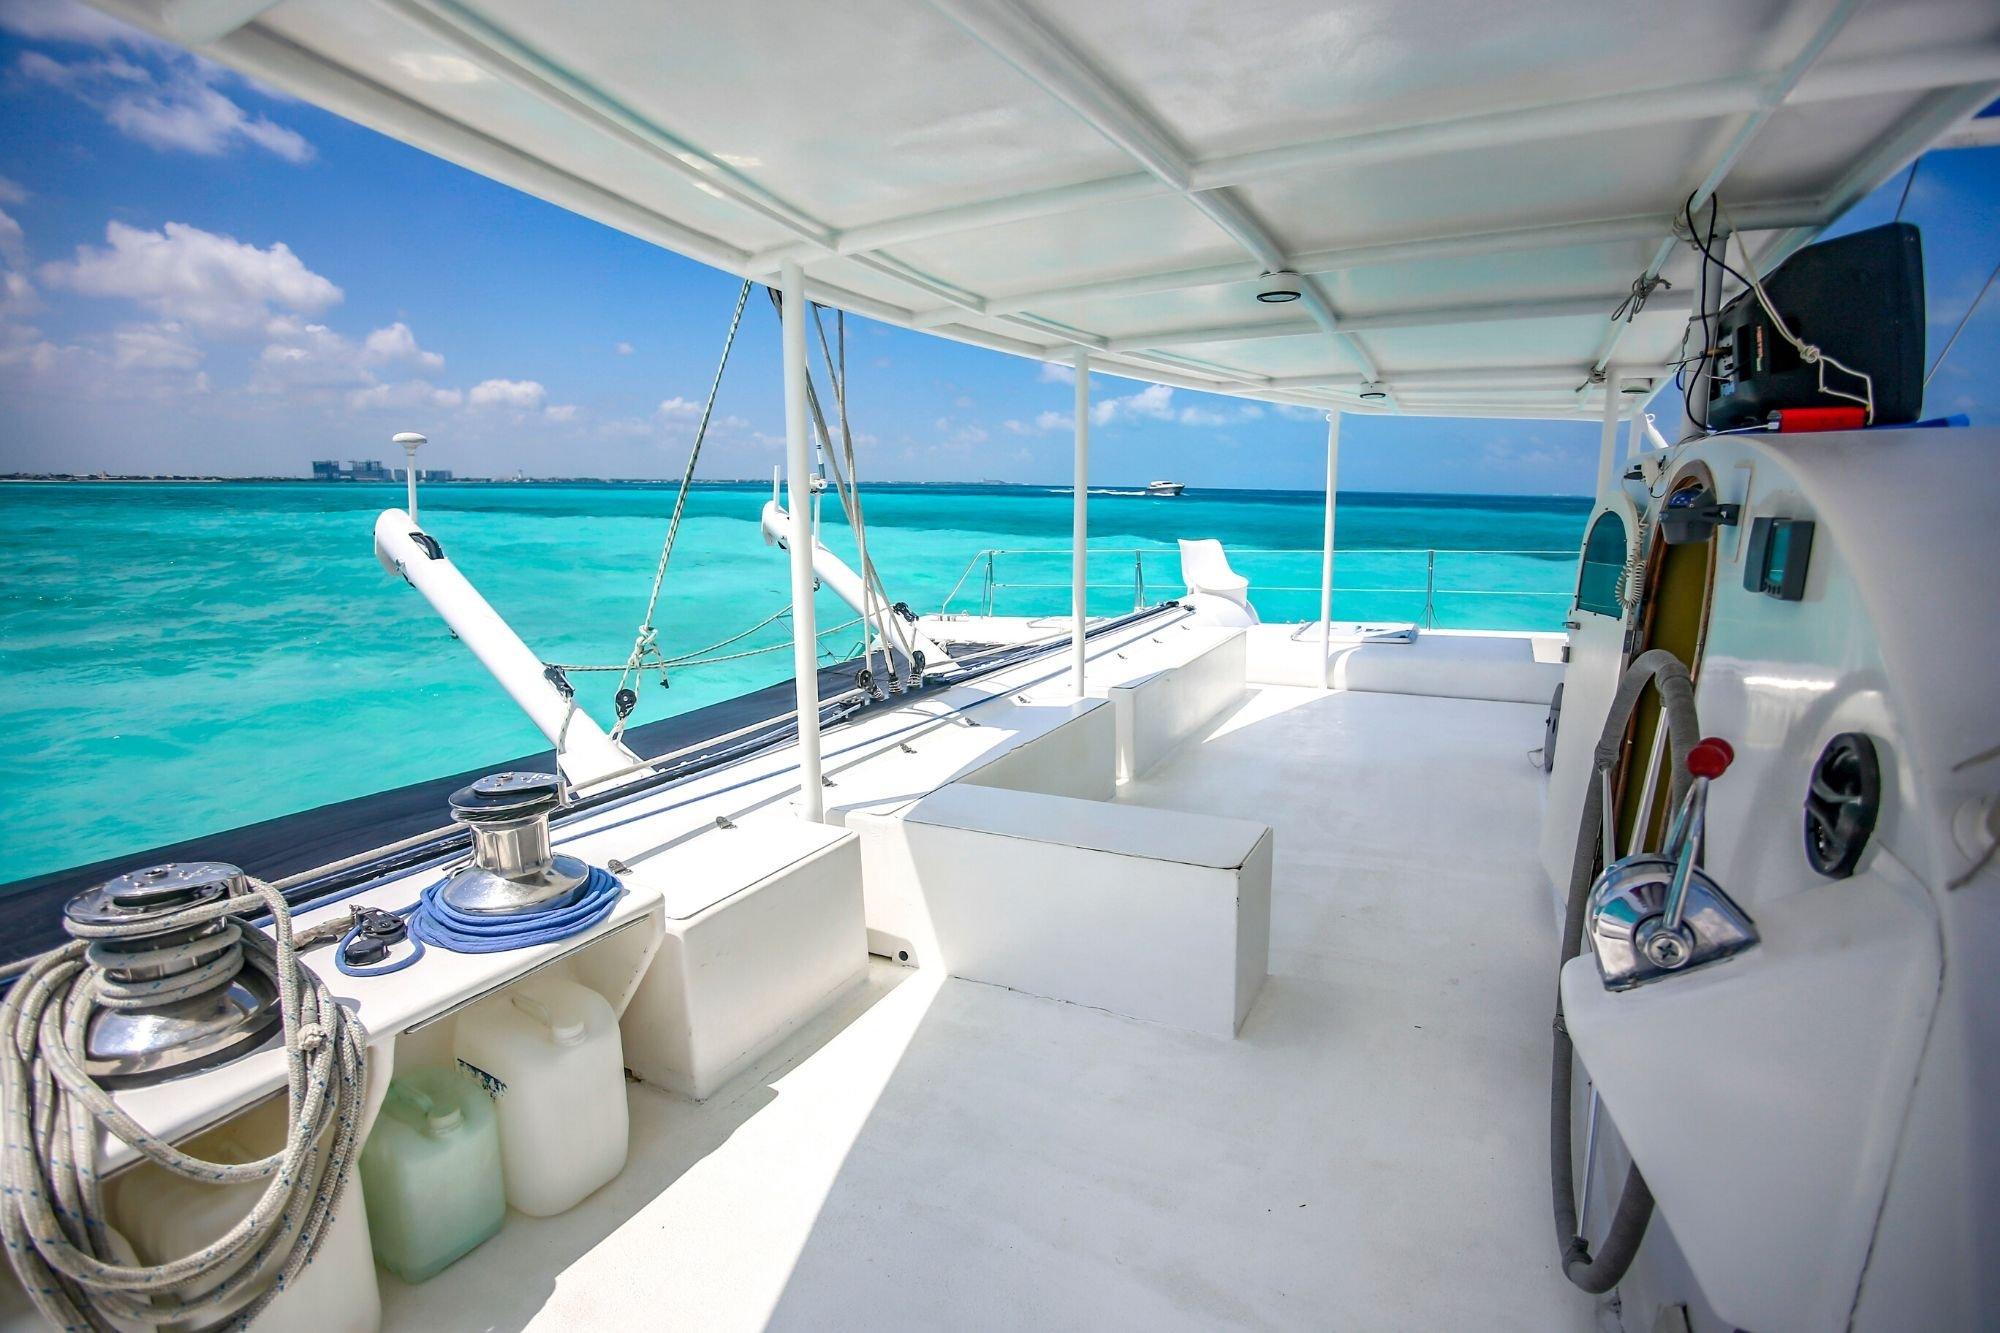 Induna - Isla Mujeres Catamaran Tour - Cancun Sailing - 4